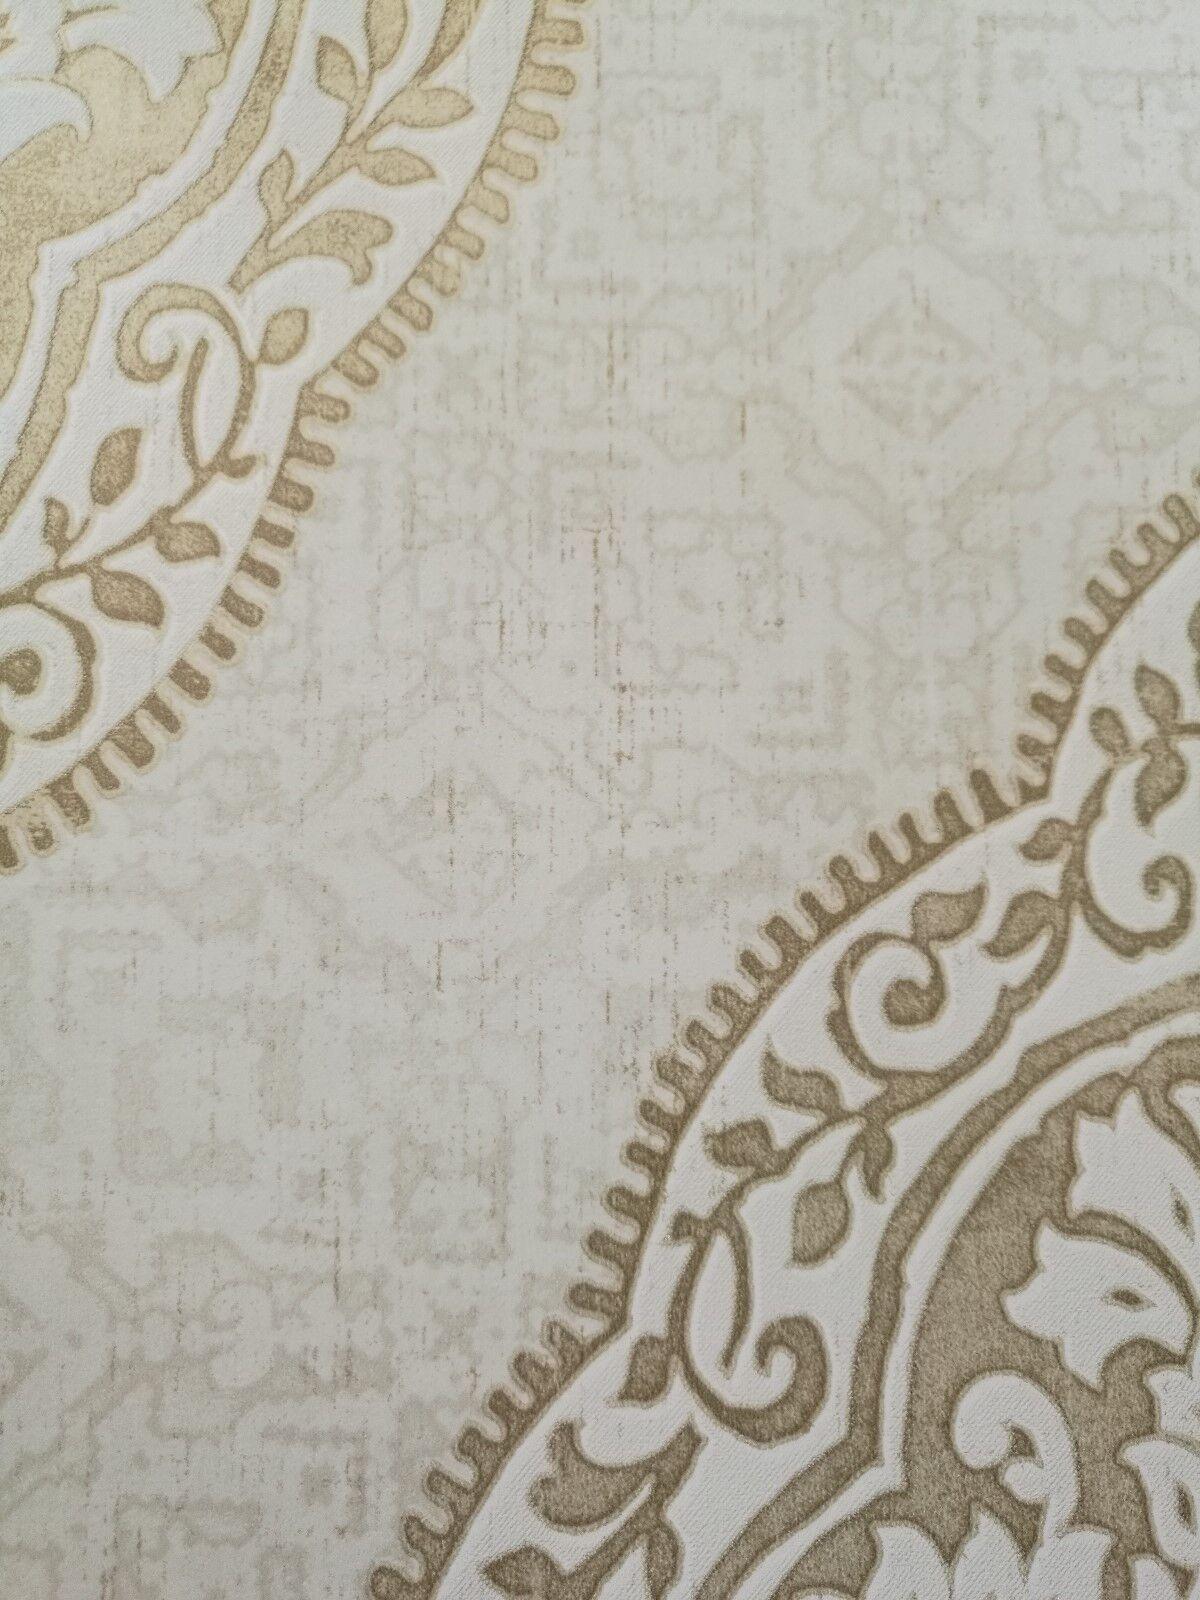 tapete designtapete ornamente gold stein eierschale. Black Bedroom Furniture Sets. Home Design Ideas